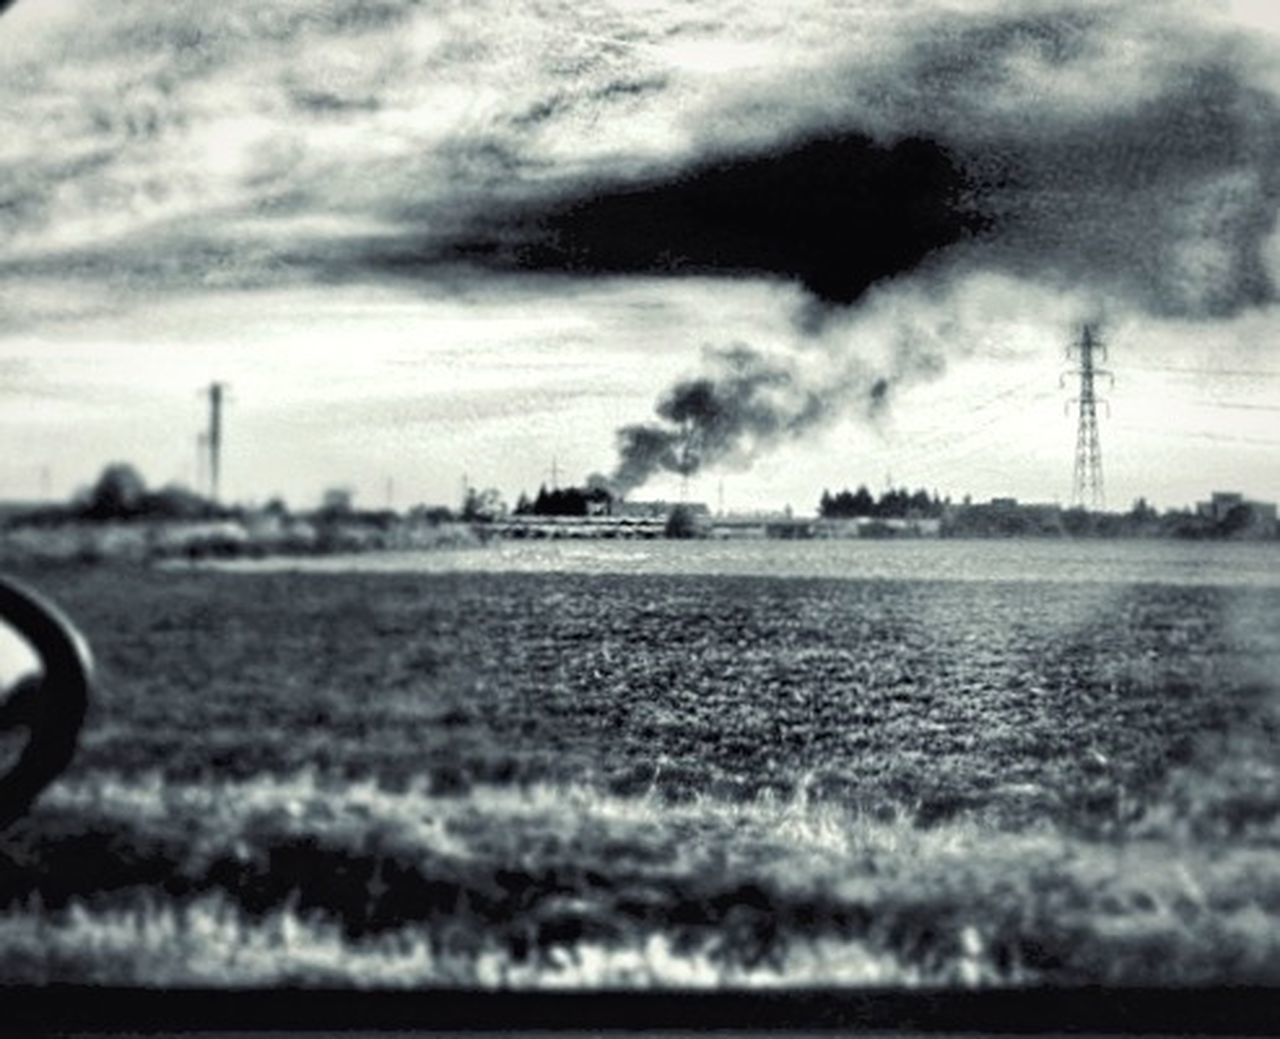 sky, cloud - sky, no people, outdoors, day, electricity pylon, city